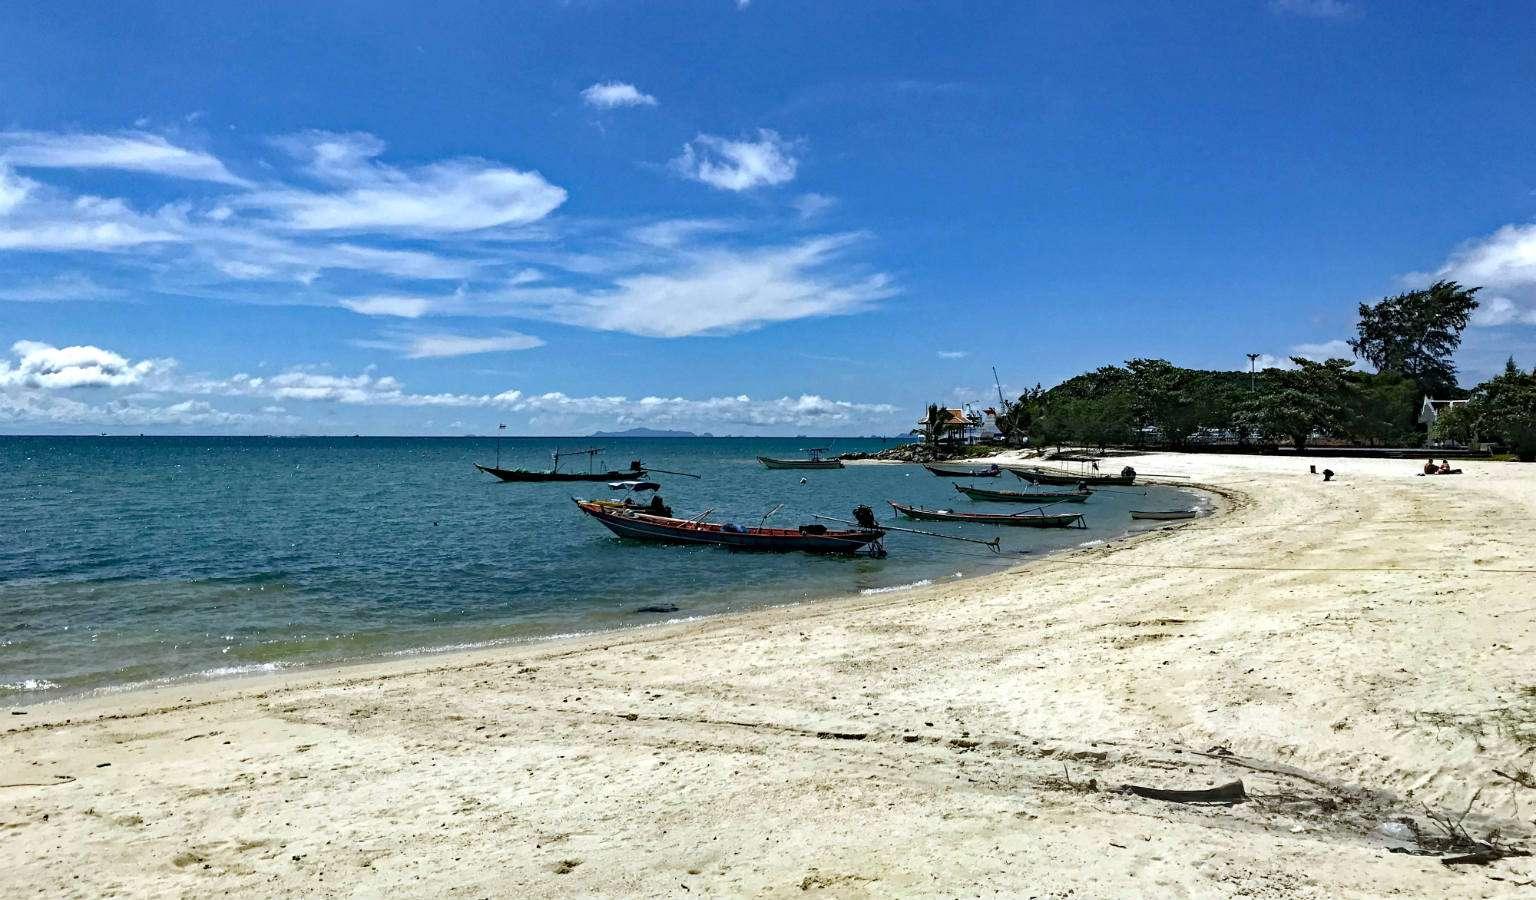 Het strand van Thong Sala in Koh Phangan, Thailand